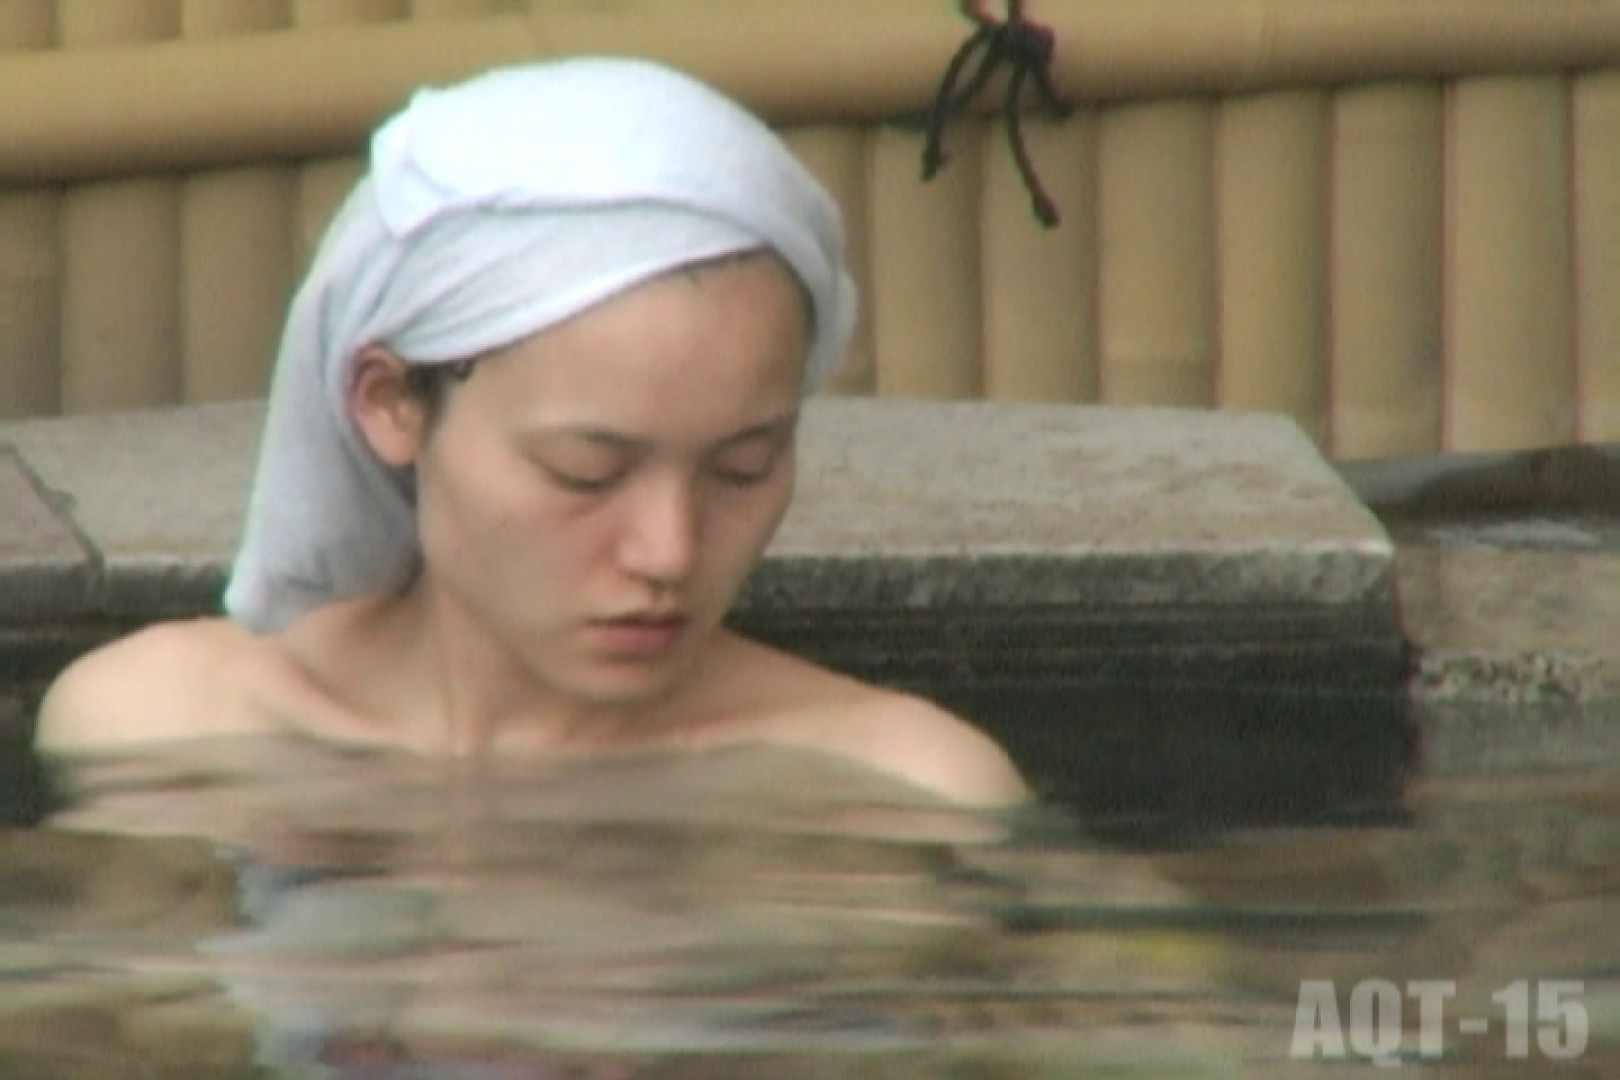 Aquaな露天風呂Vol.836 OLのエロ生活 オメコ動画キャプチャ 101連発 77